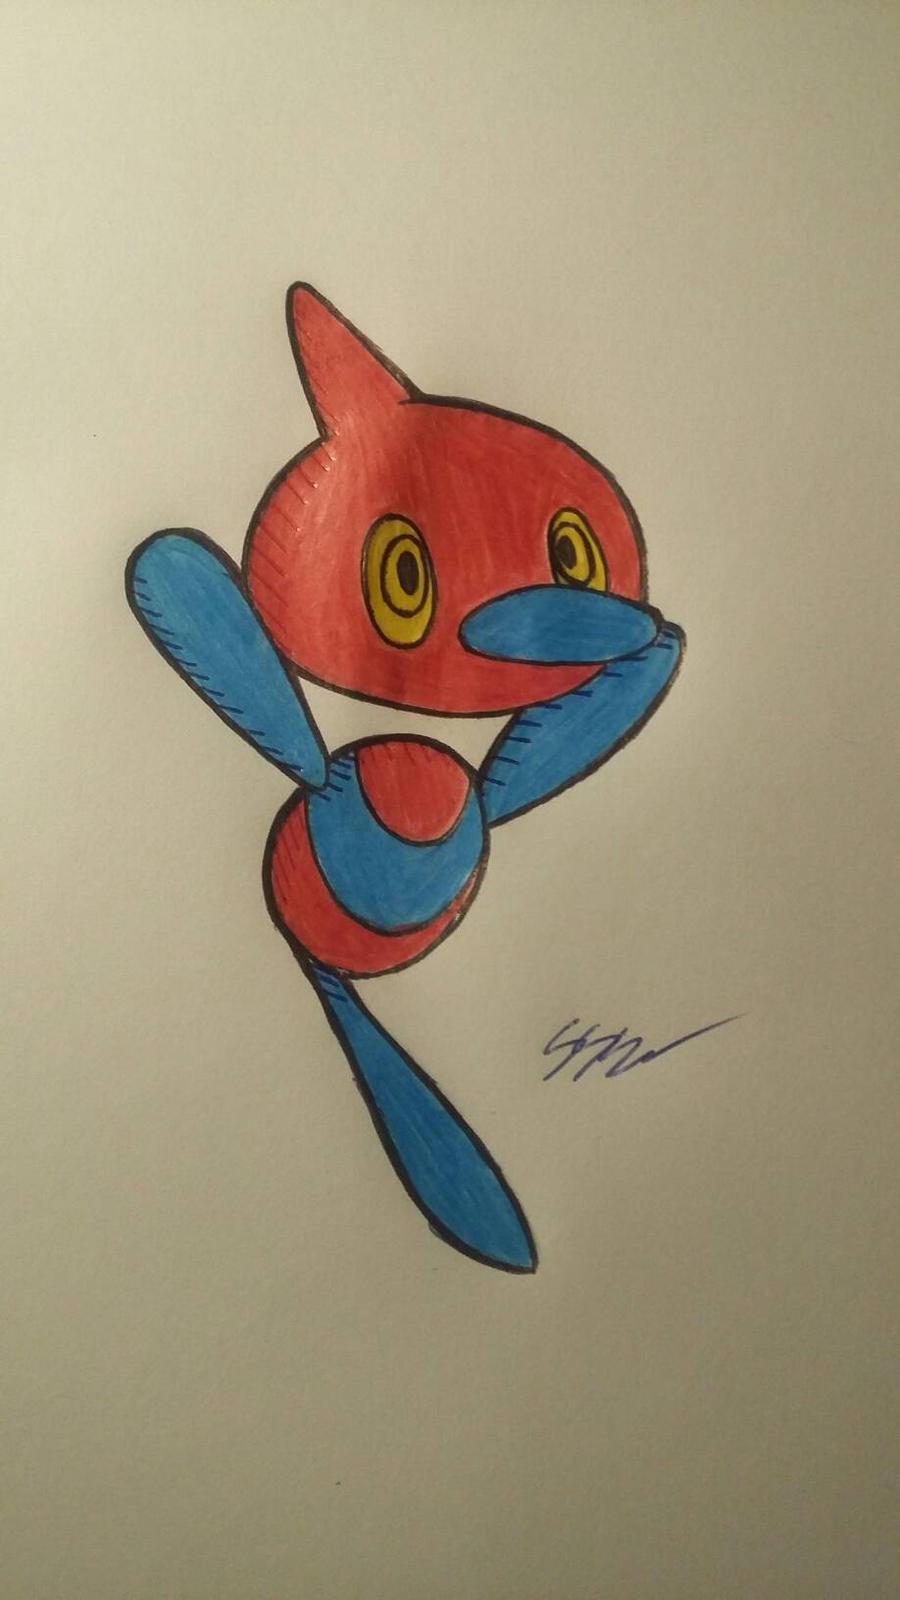 Pokemon Art challenge day 1 by RikoriStorm